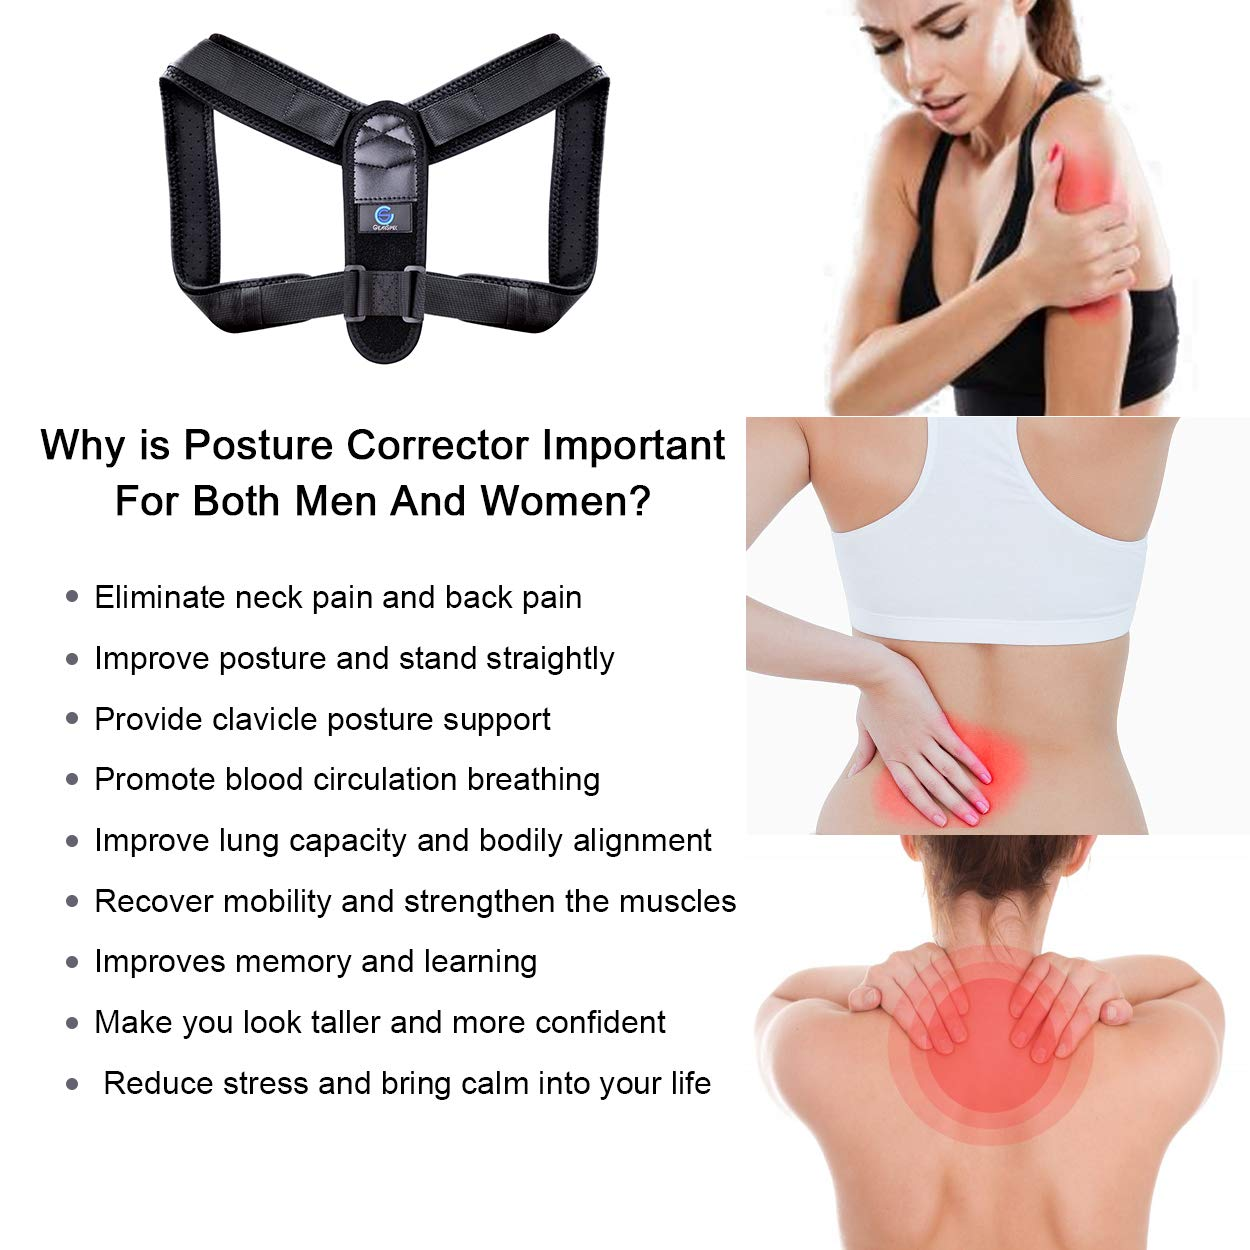 Posture Corrector for Women Men, Upper Back Brace for Clavicle Support, Adjustable Back Straightener and Providing Pain Relief from Neck, Back & Shoulder L